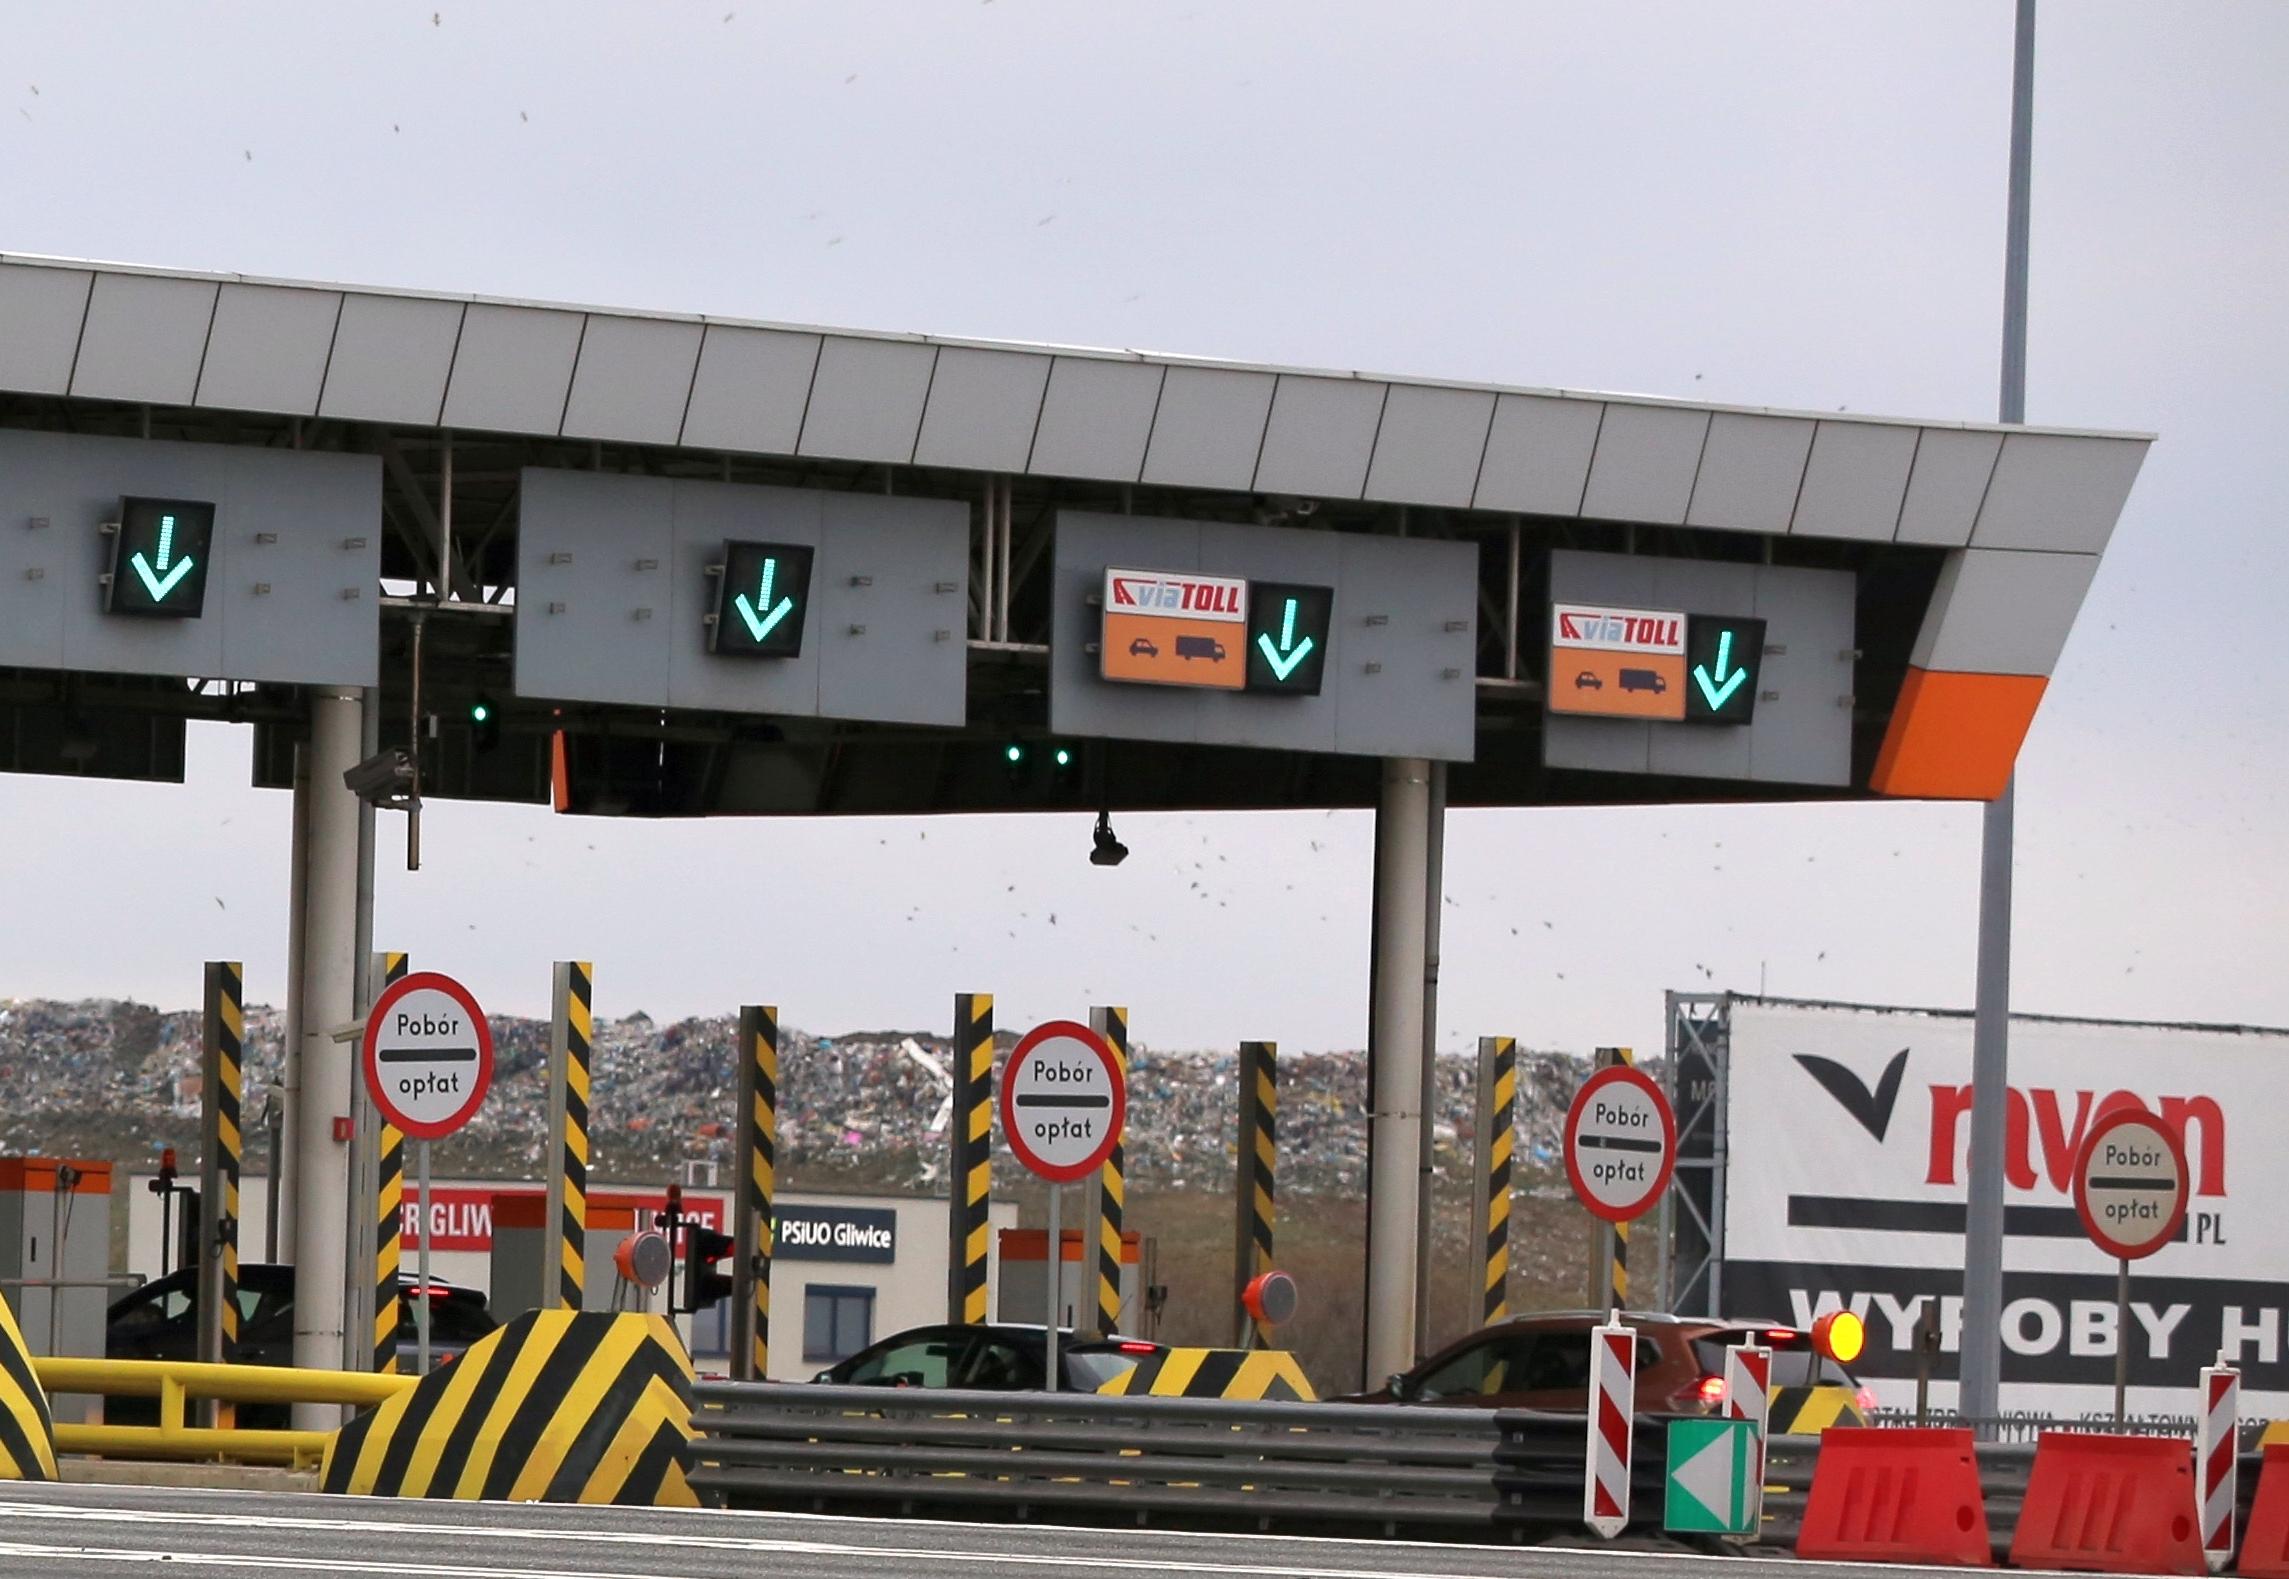 e-toll-gps-pobor-oplat-autostrada-a2-a4-aplikacja-mobilna